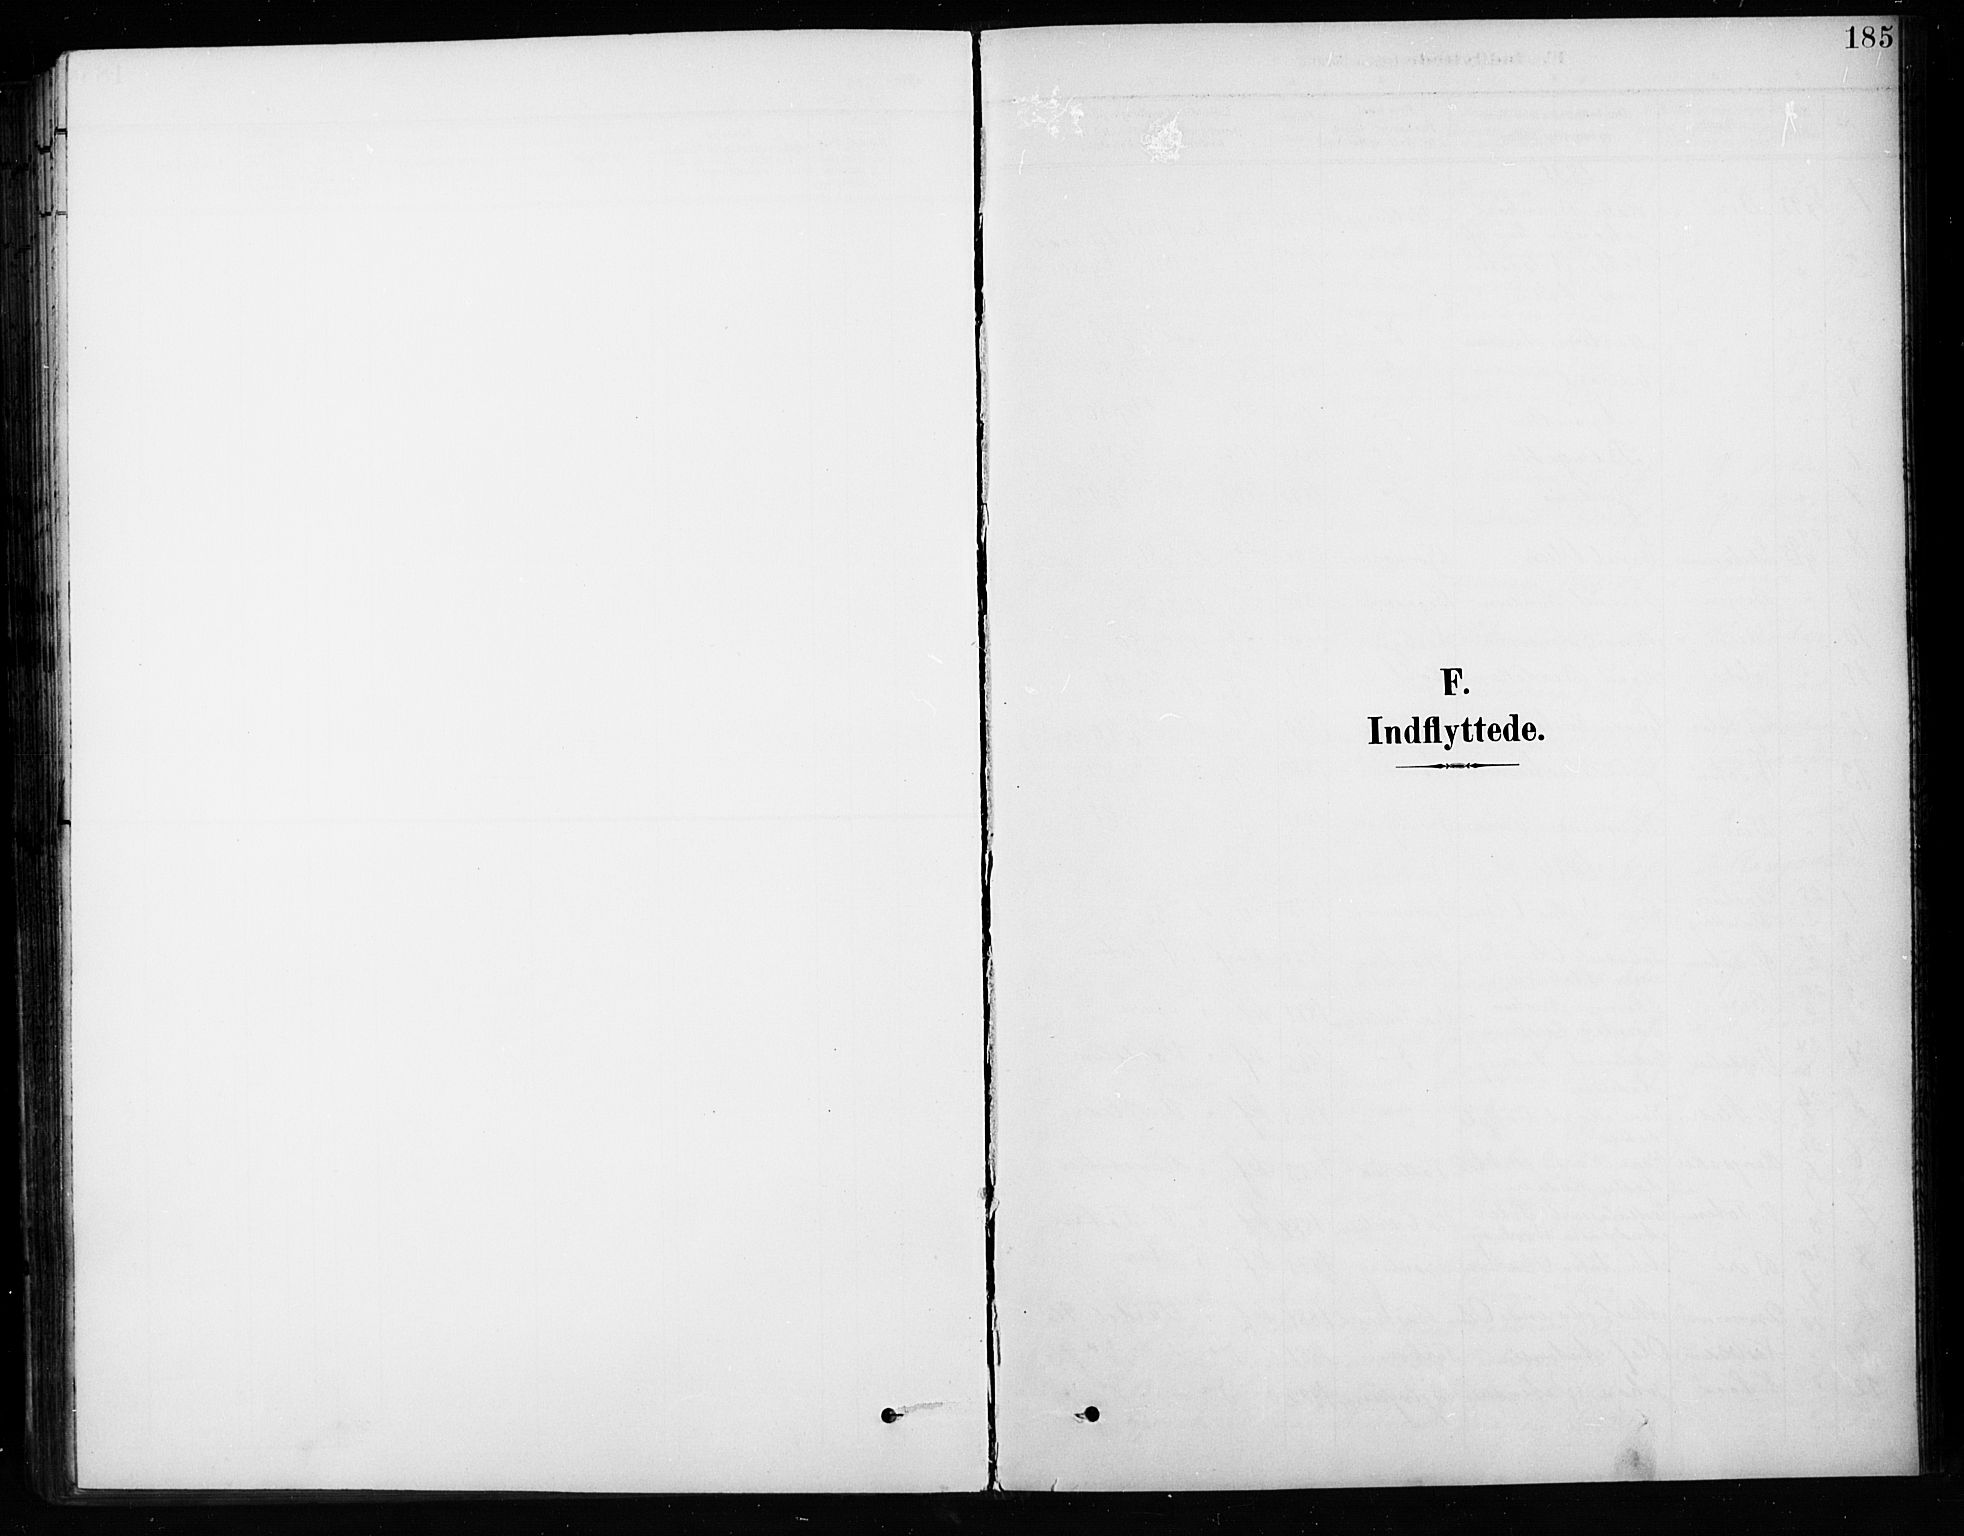 SAH, Vardal prestekontor, H/Ha/Hab/L0010: Klokkerbok nr. 10, 1895-1903, s. 185